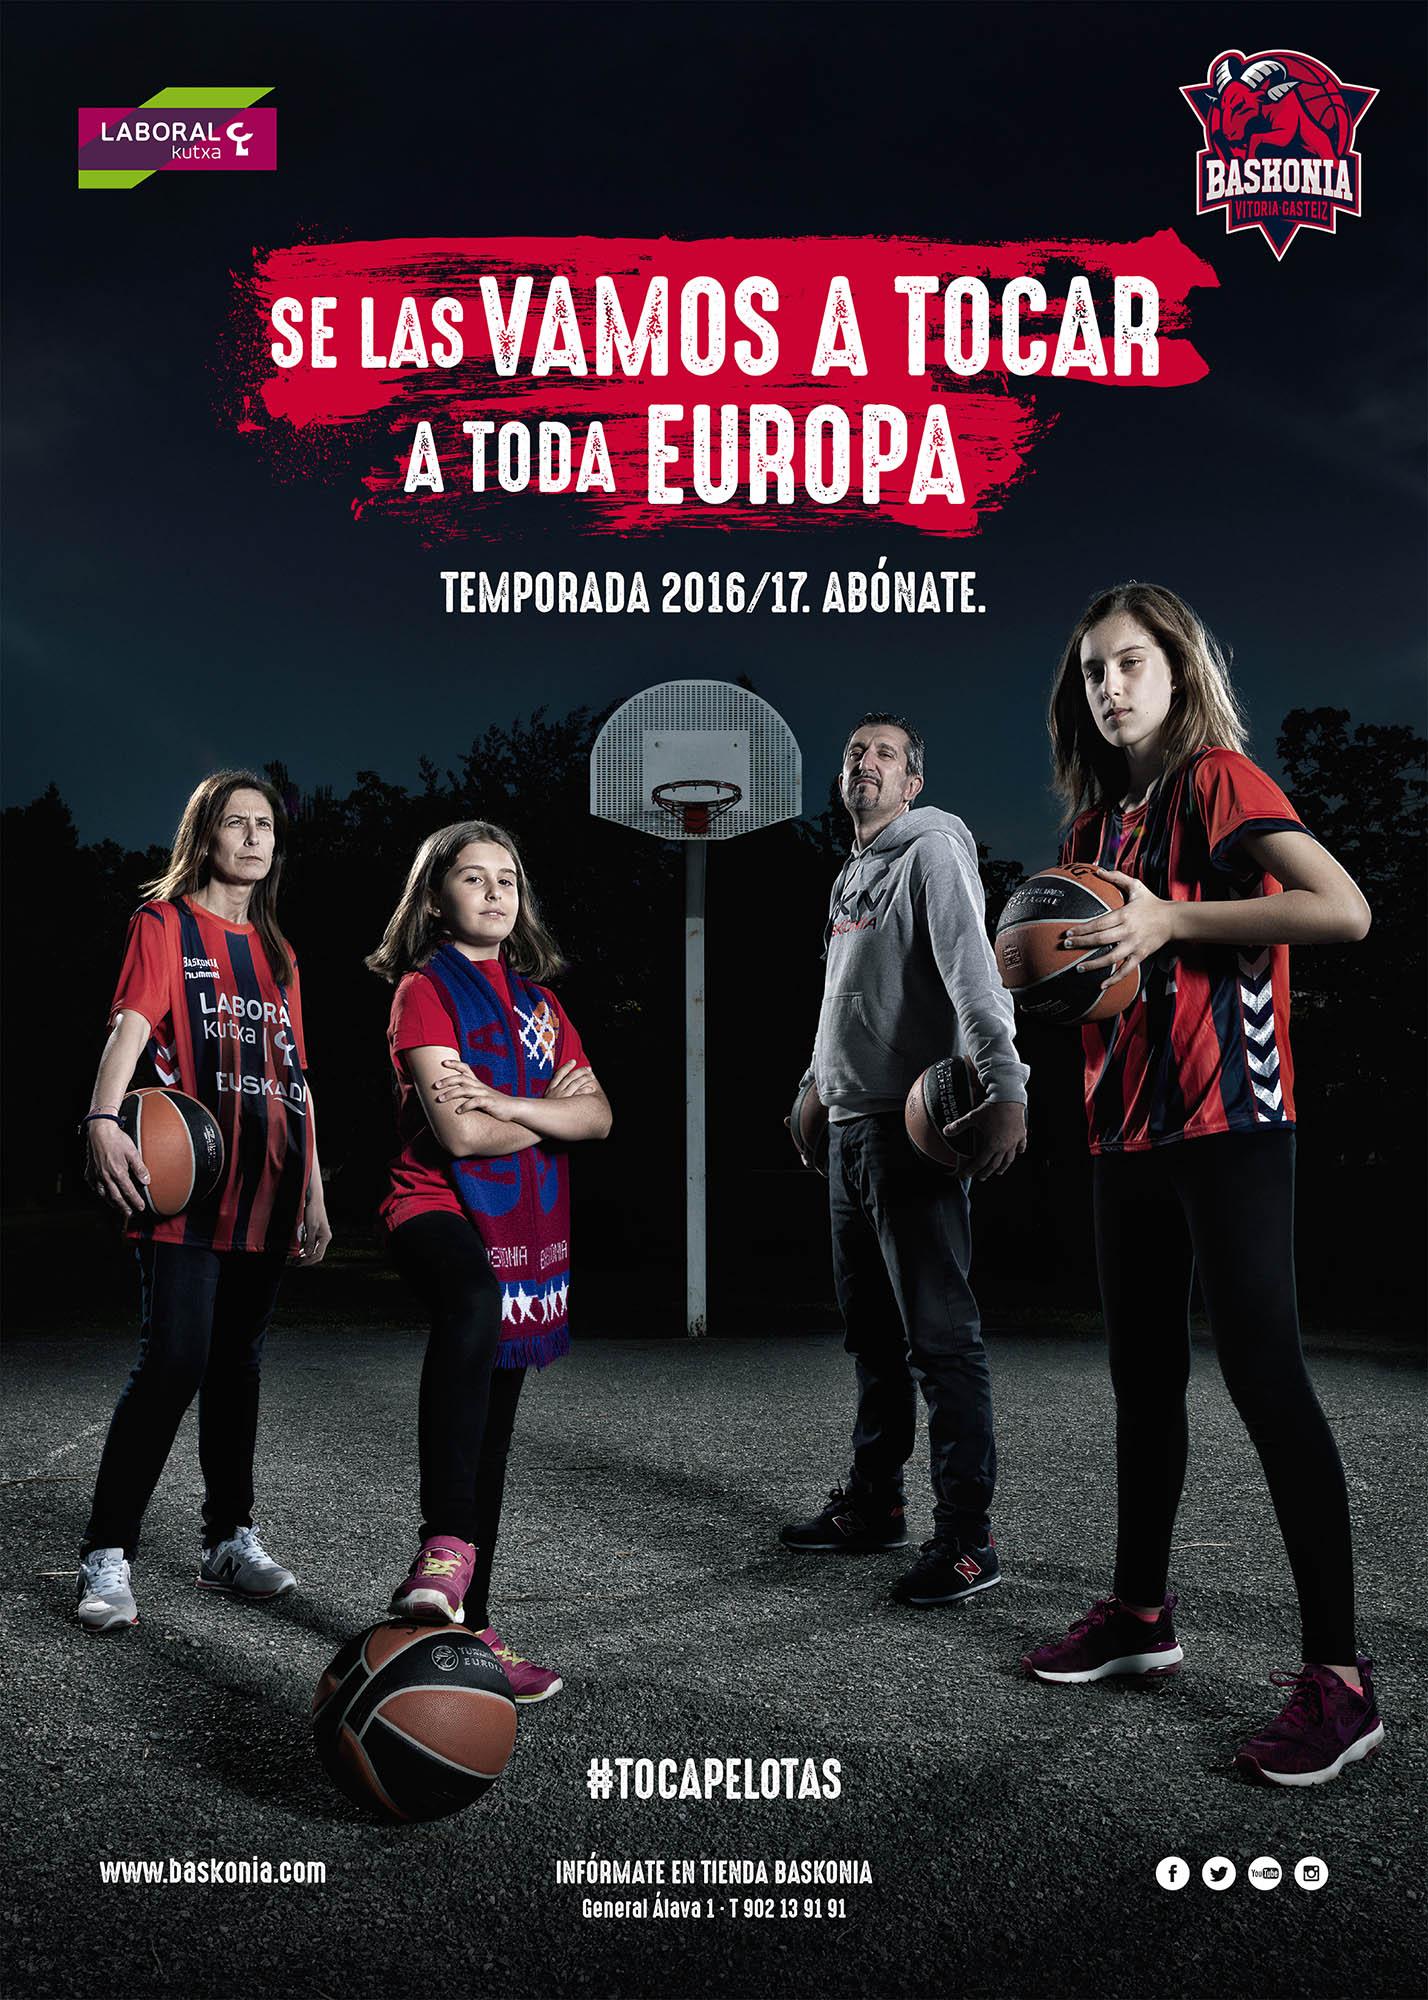 baskonia vitoria gasteiz team basket baloncesto campaña abonados erredehierro